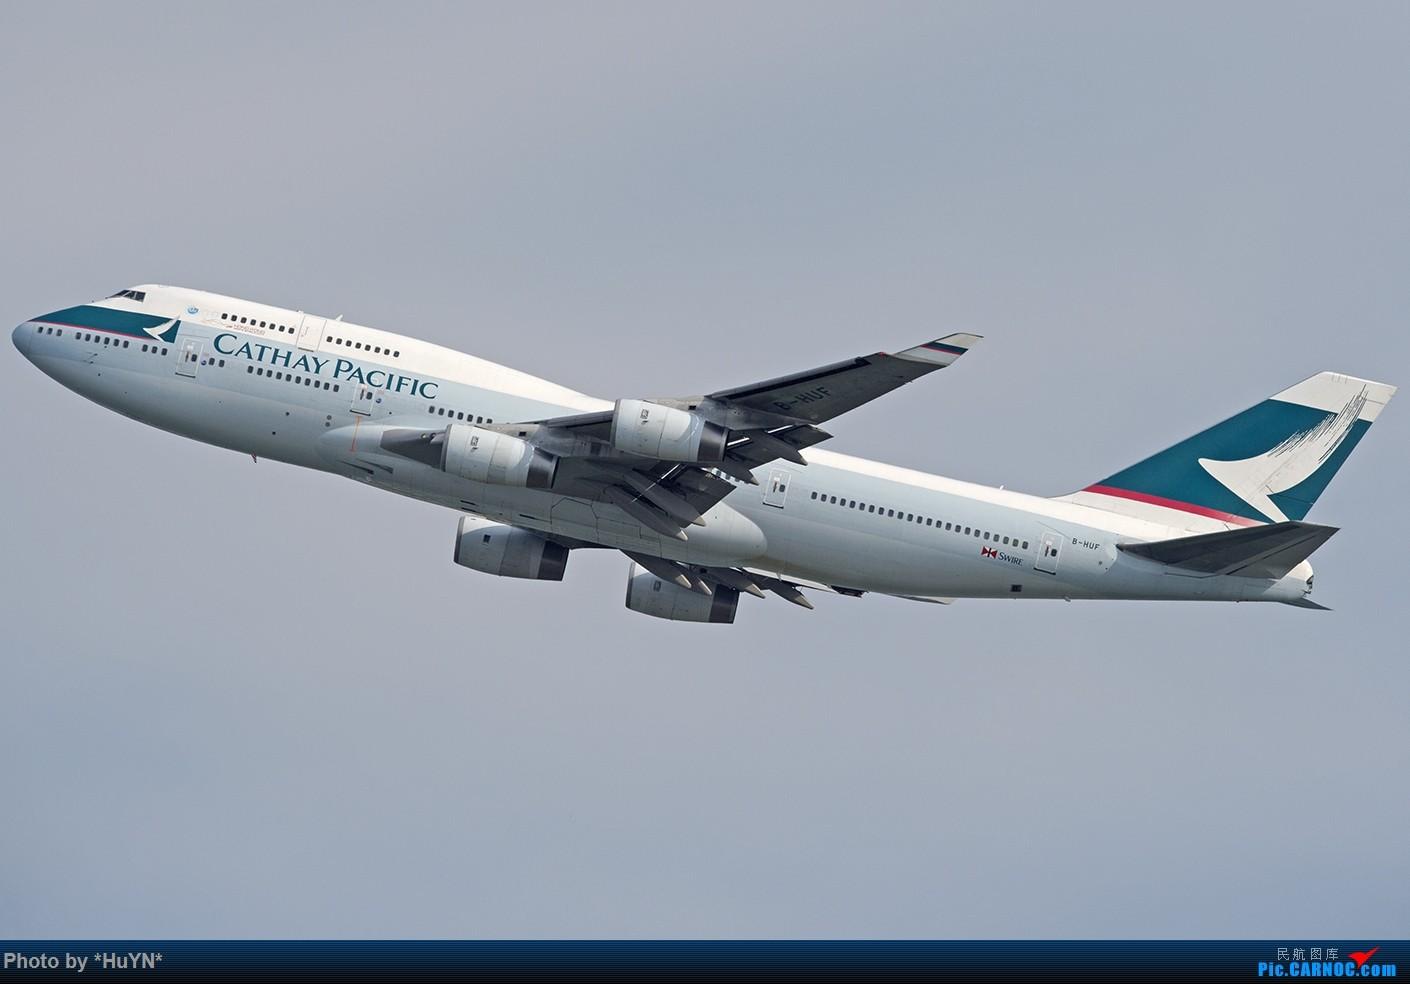 Re:[原创]听说又能审图了我也试试之二 BOEING 747-400 B-HUF 中国香港赤鱲角国际机场